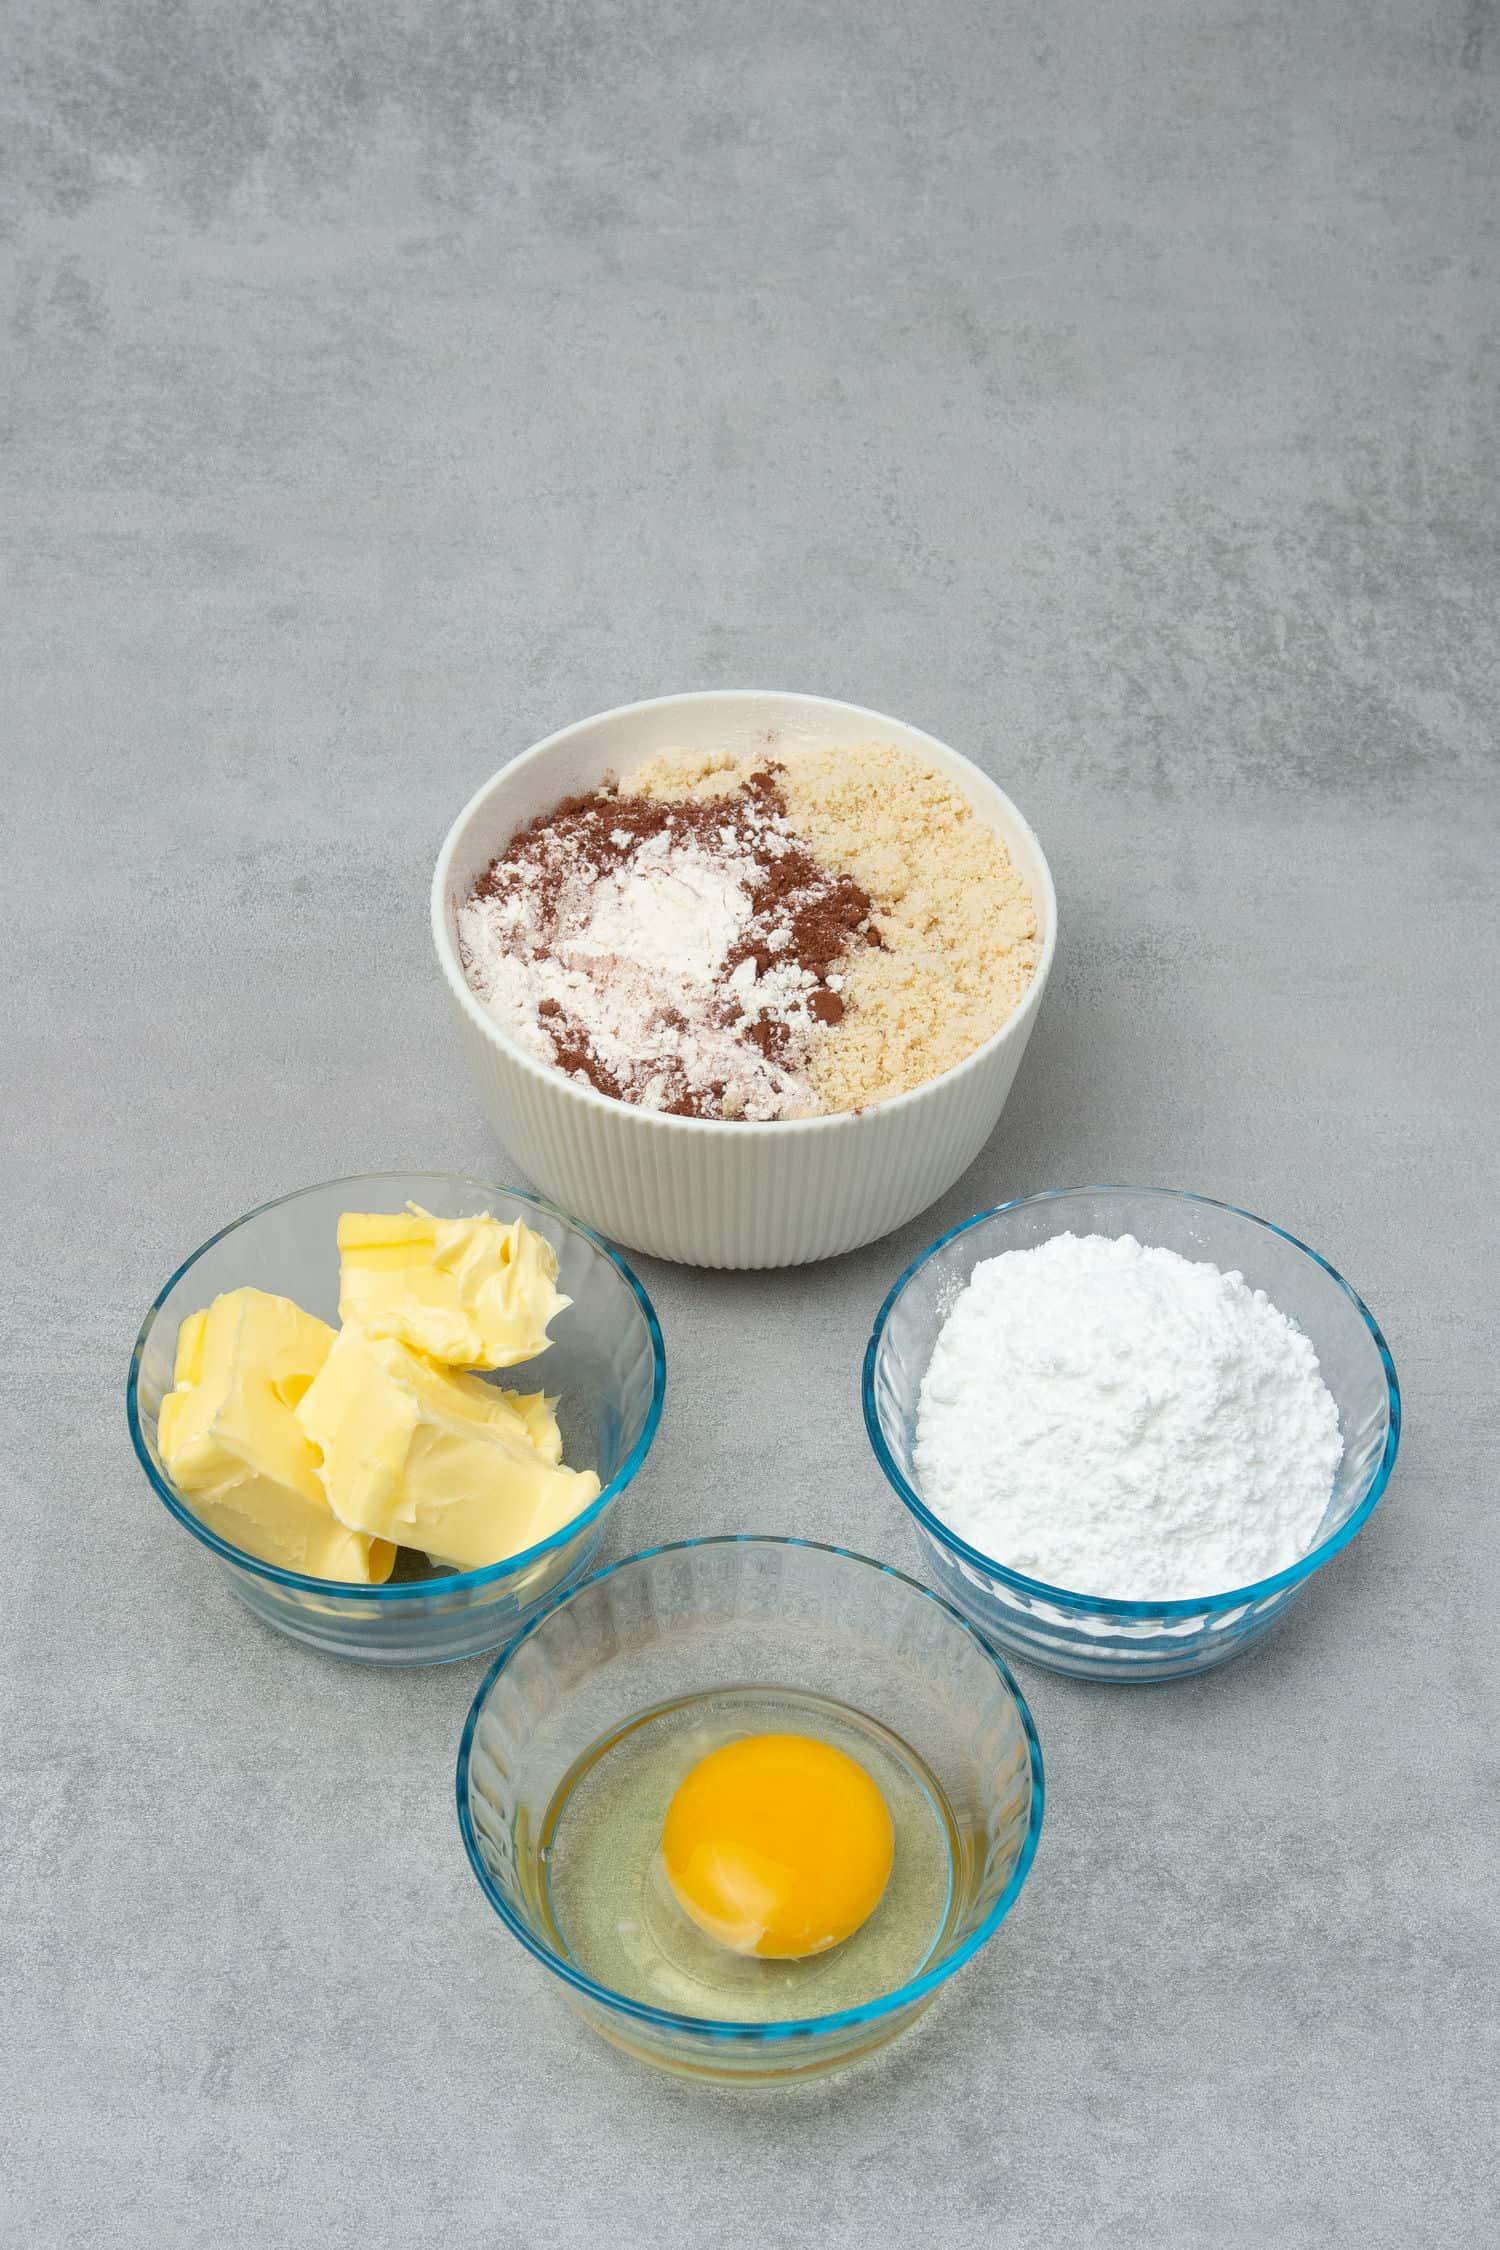 Chocolate Pâte Sablée ingredients